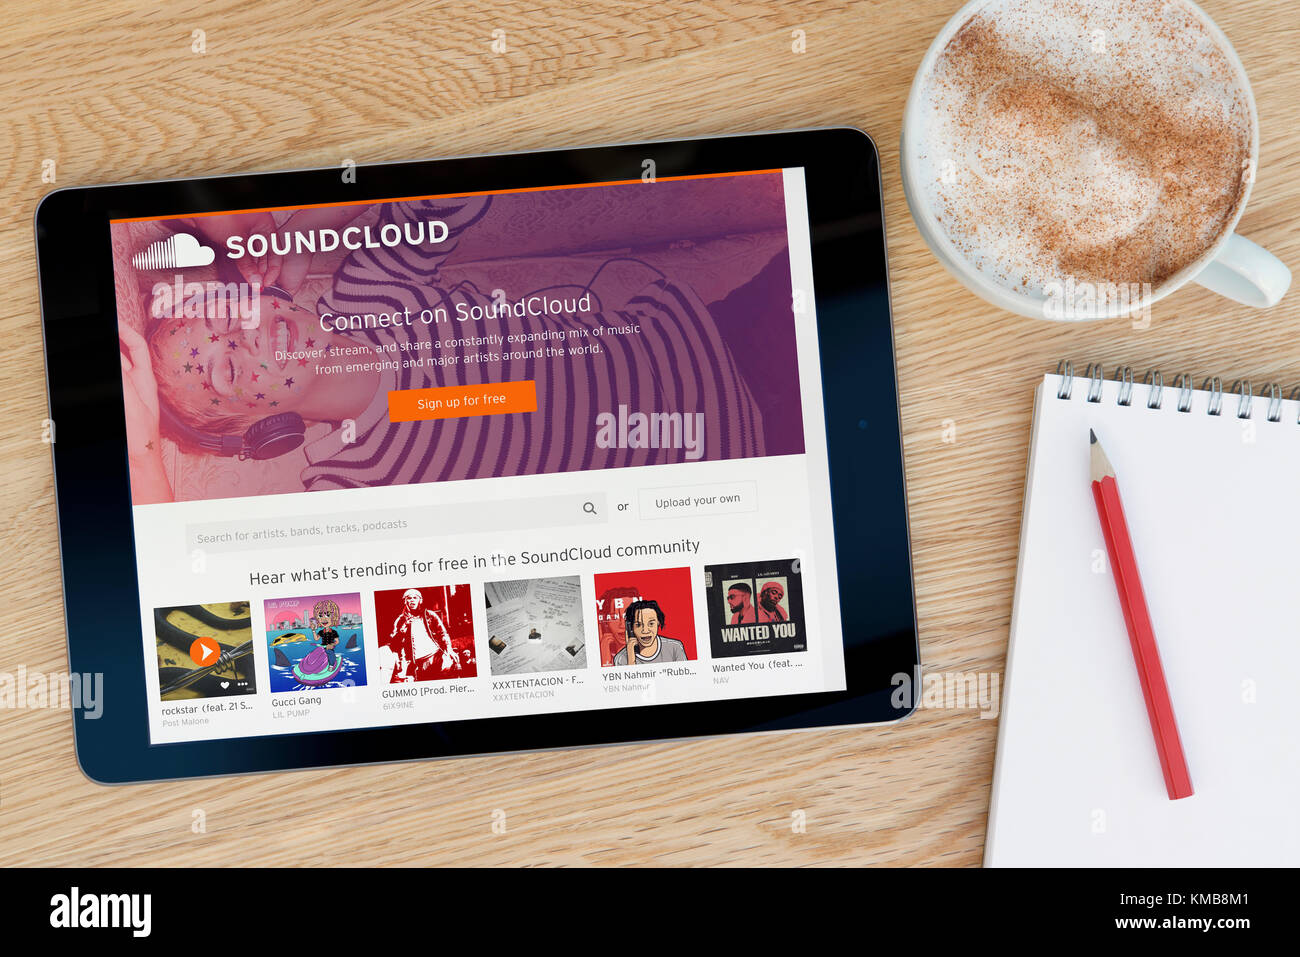 Soundcloud Stock Photos & Soundcloud Stock Images - Alamy